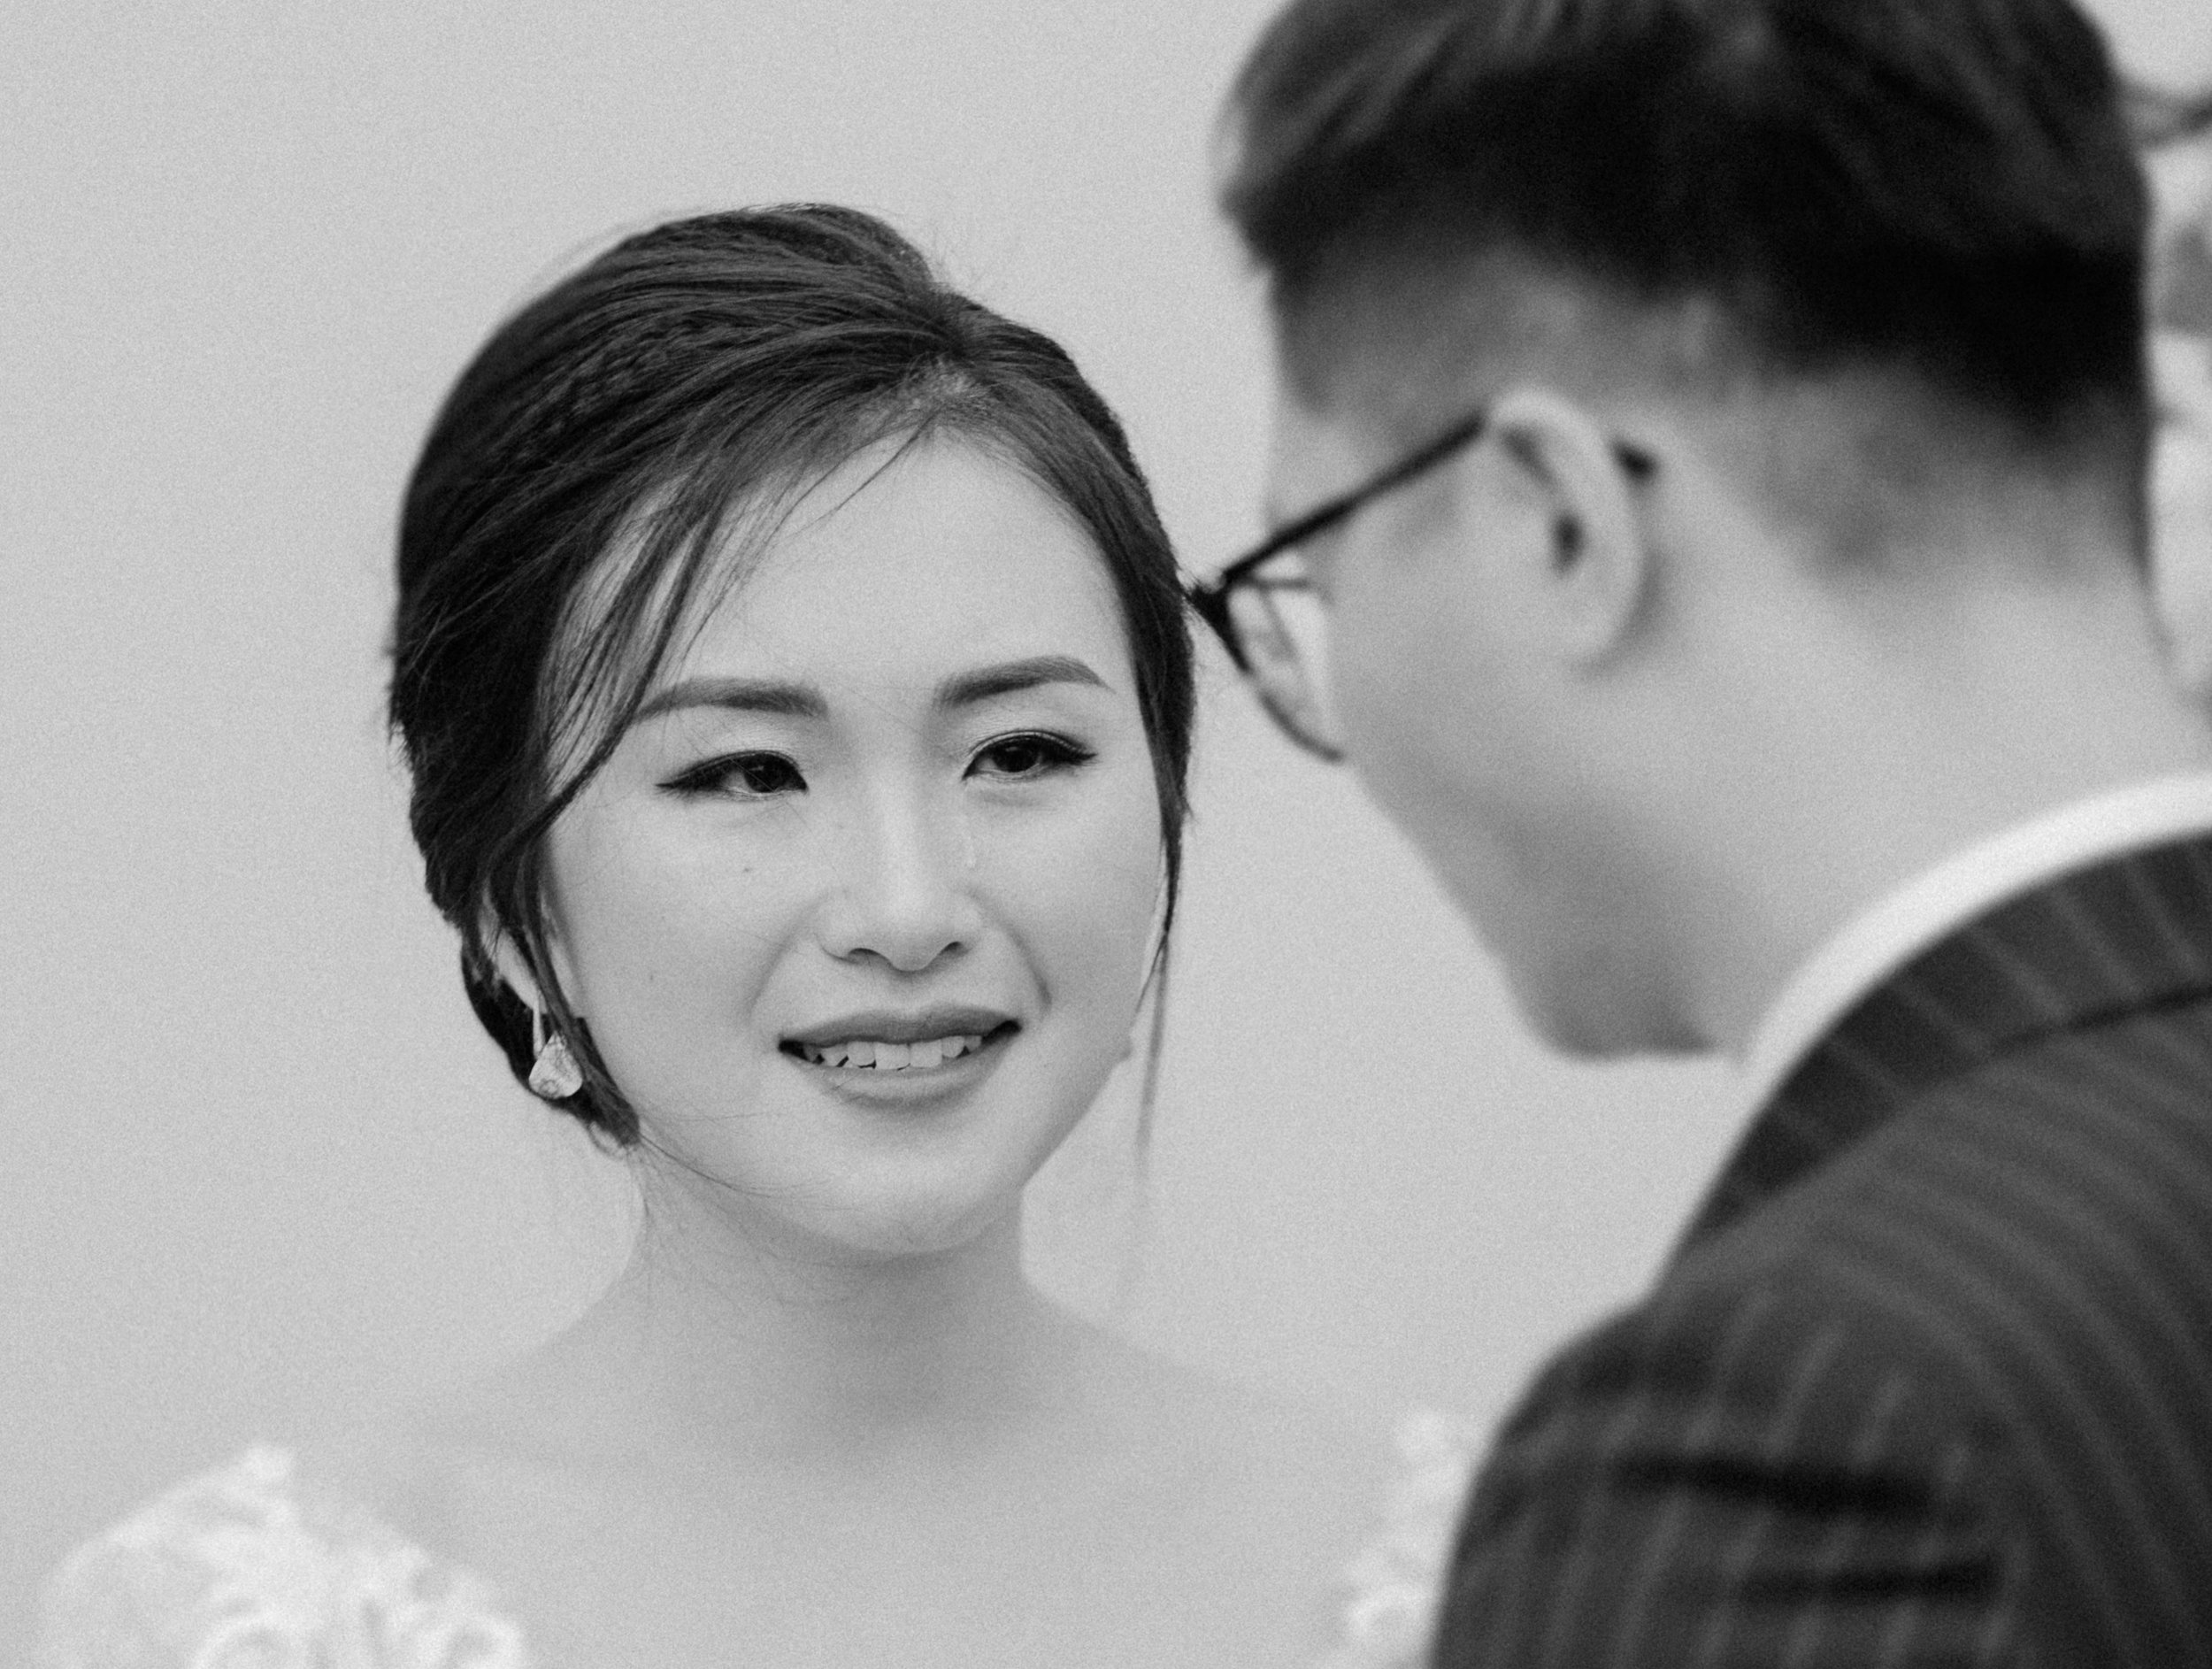 Mirrorwedding Destination Photographer TopofHanoi Duc Anh Hien Trang 164727.jpg